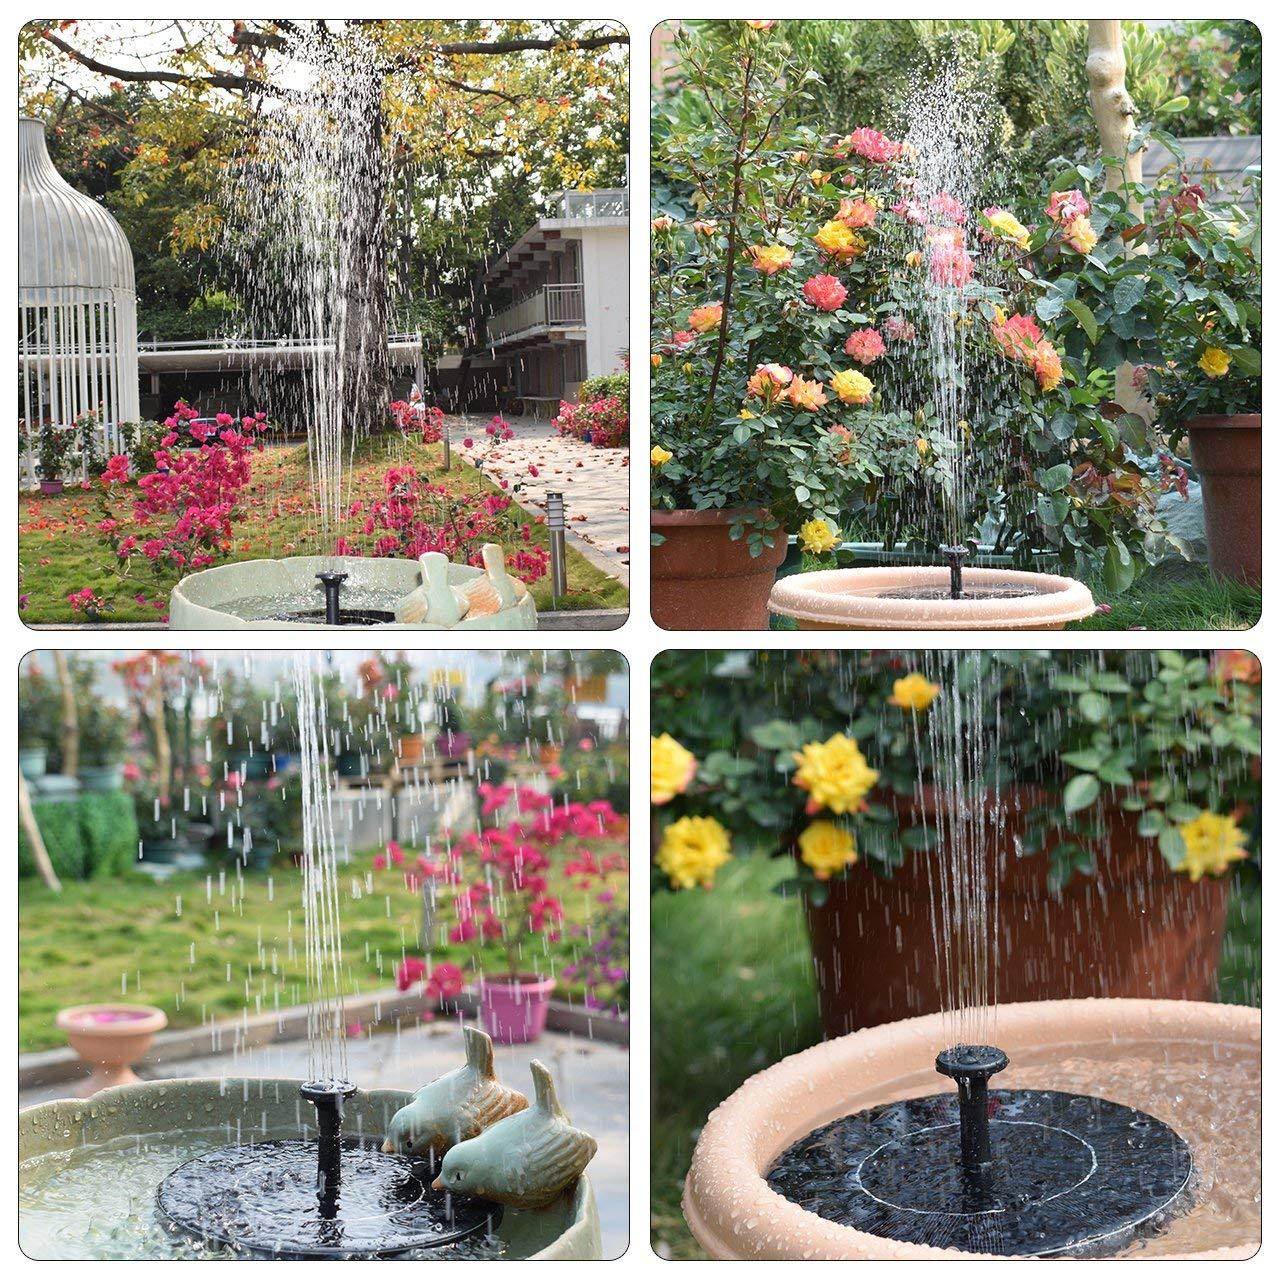 LATITOP Solar Fountain Solar Powered Fountain with Battery Backup for Bird Bath 2.4w Outdoor Solar Garden Fountain for Pond Pool Fish Tank Lawn